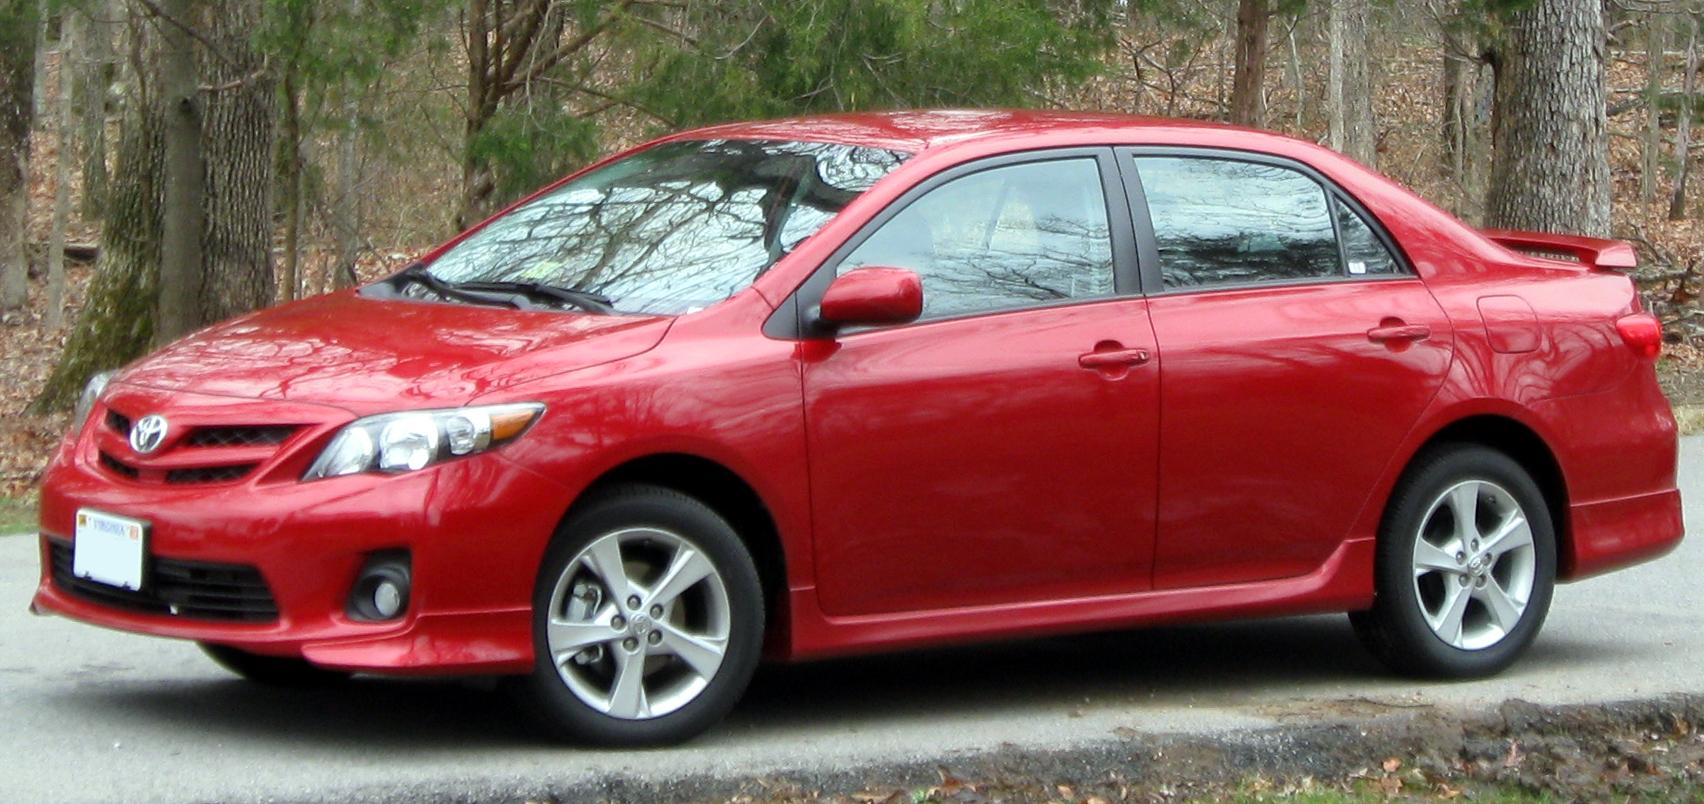 Description 2011 Toyota Corolla -- 04-09-2011.jpg